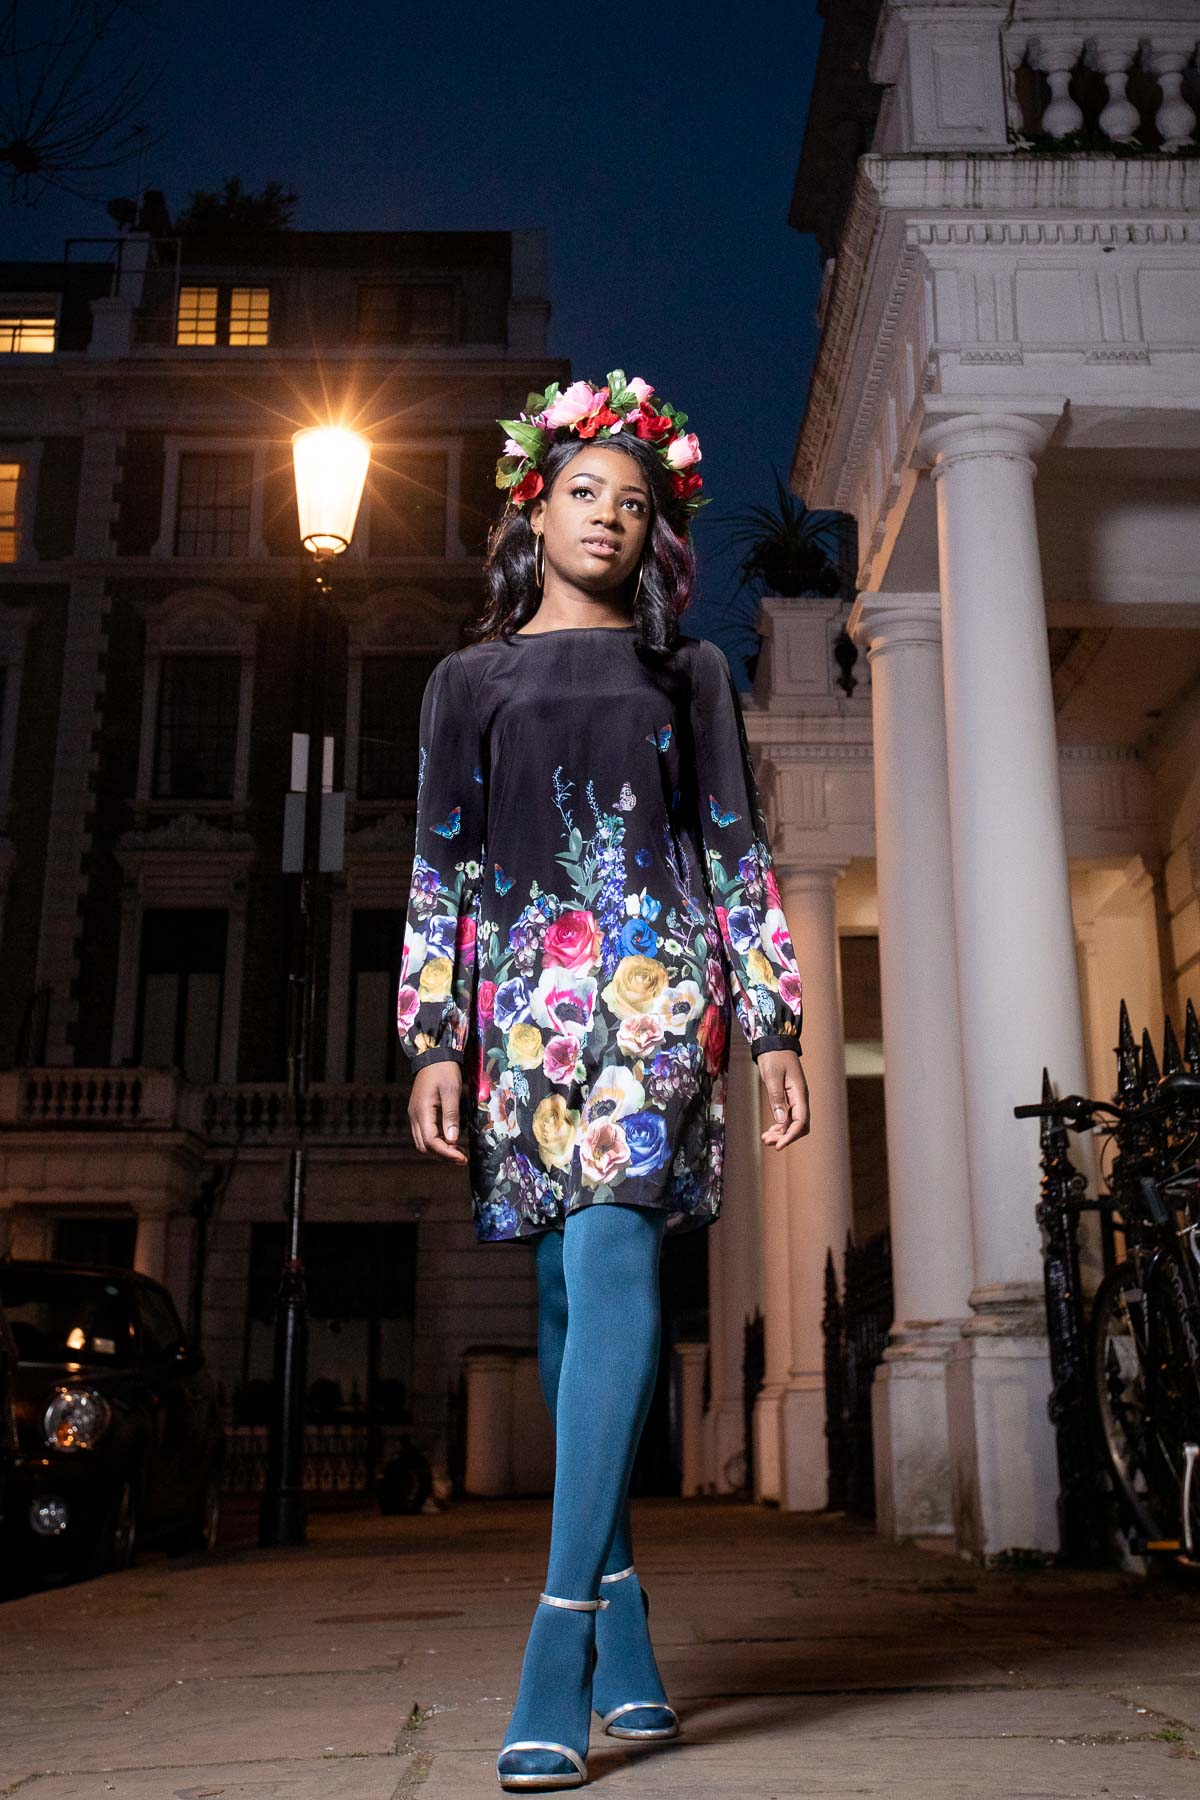 Russian-style-fashion-photographer-london-floral-Русский-стиль-мода-павловопосадский-платок-natalia-smith-photography-0021.jpg